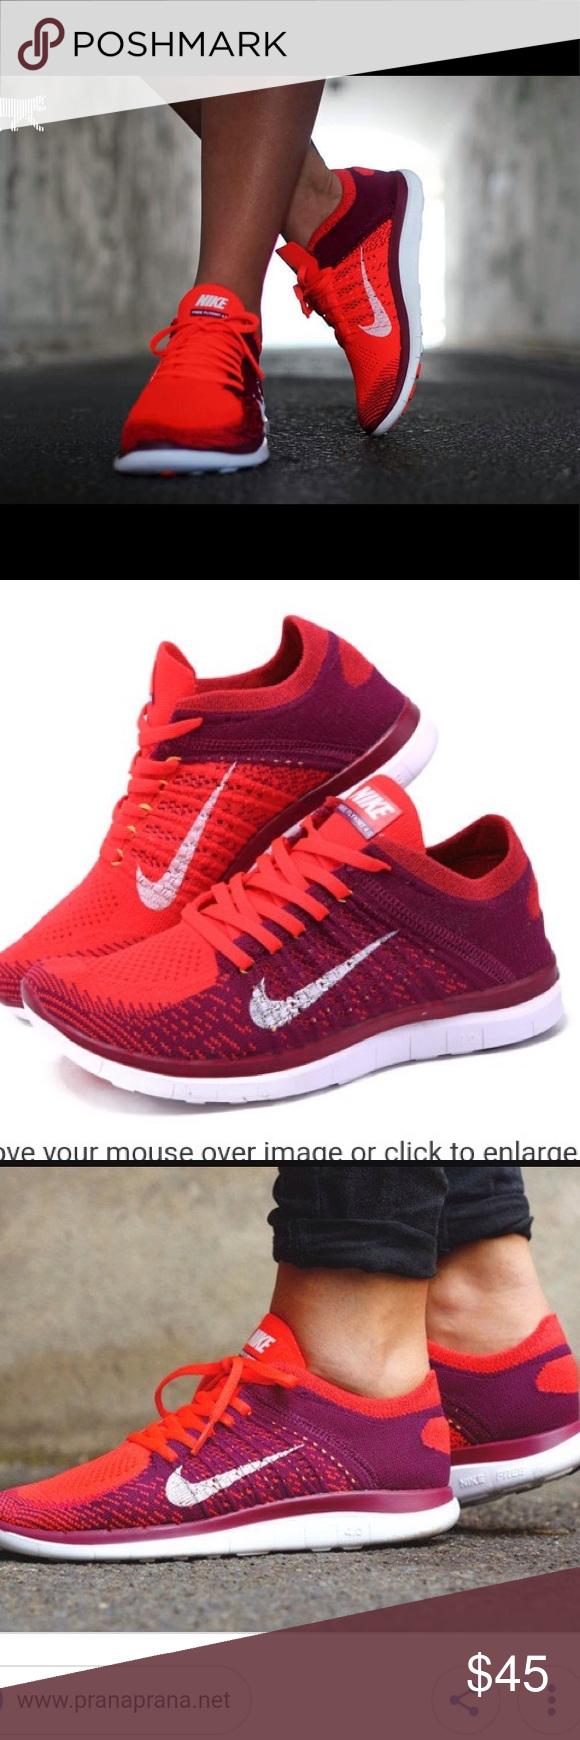 "91387732394b Nike Free Flyknit 4.0 ""Bright Crimson""❤ Nike Free Flyknit 4.0 ""Bright  Crimson"" Bright Crimson White Raspberry Red SKU  631050-616 Price   150 Nike  Shoes ..."